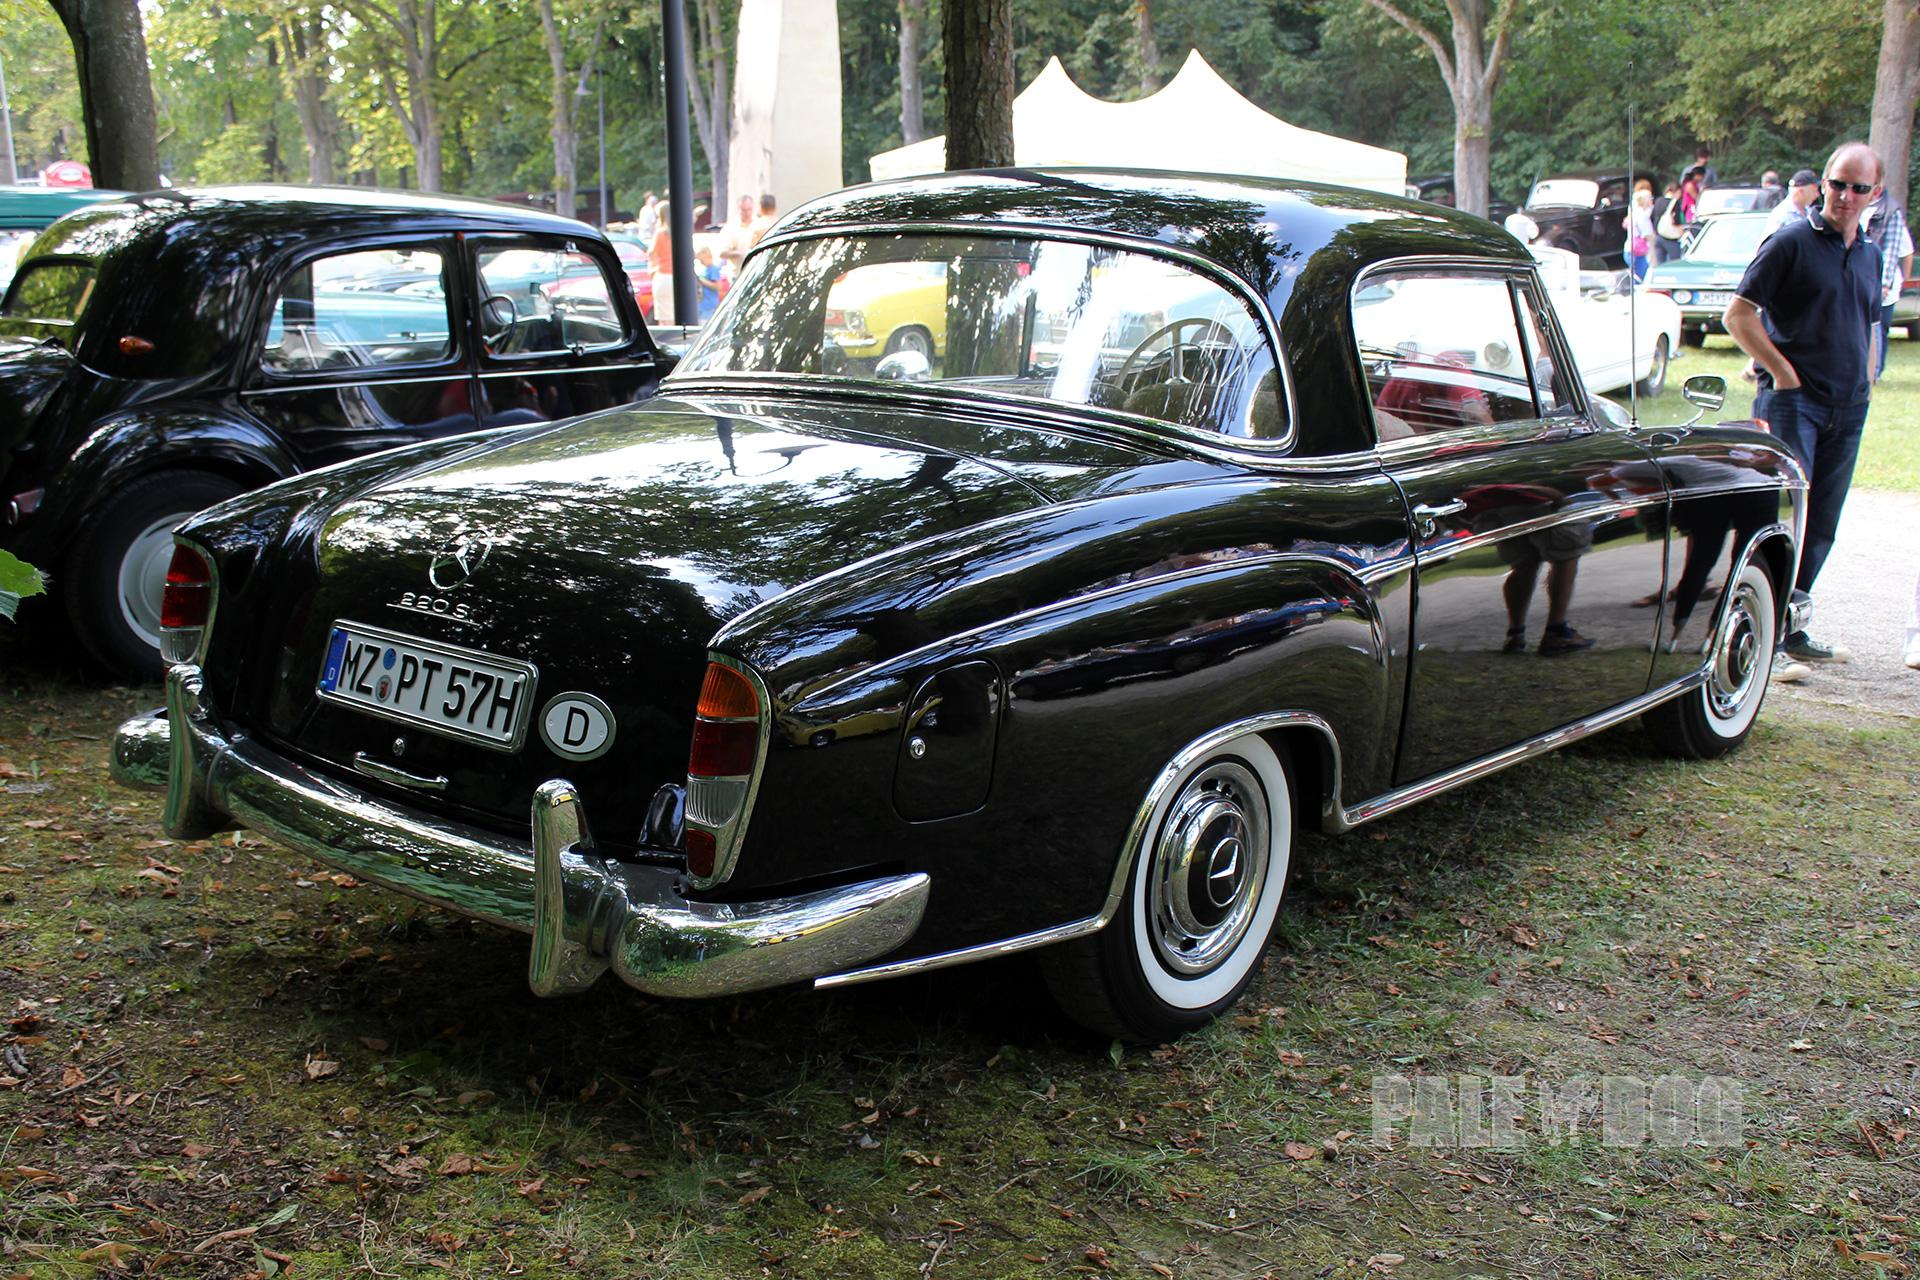 1957 mercedes benz 220 s coup rear view post war for 1957 mercedes benz 220s